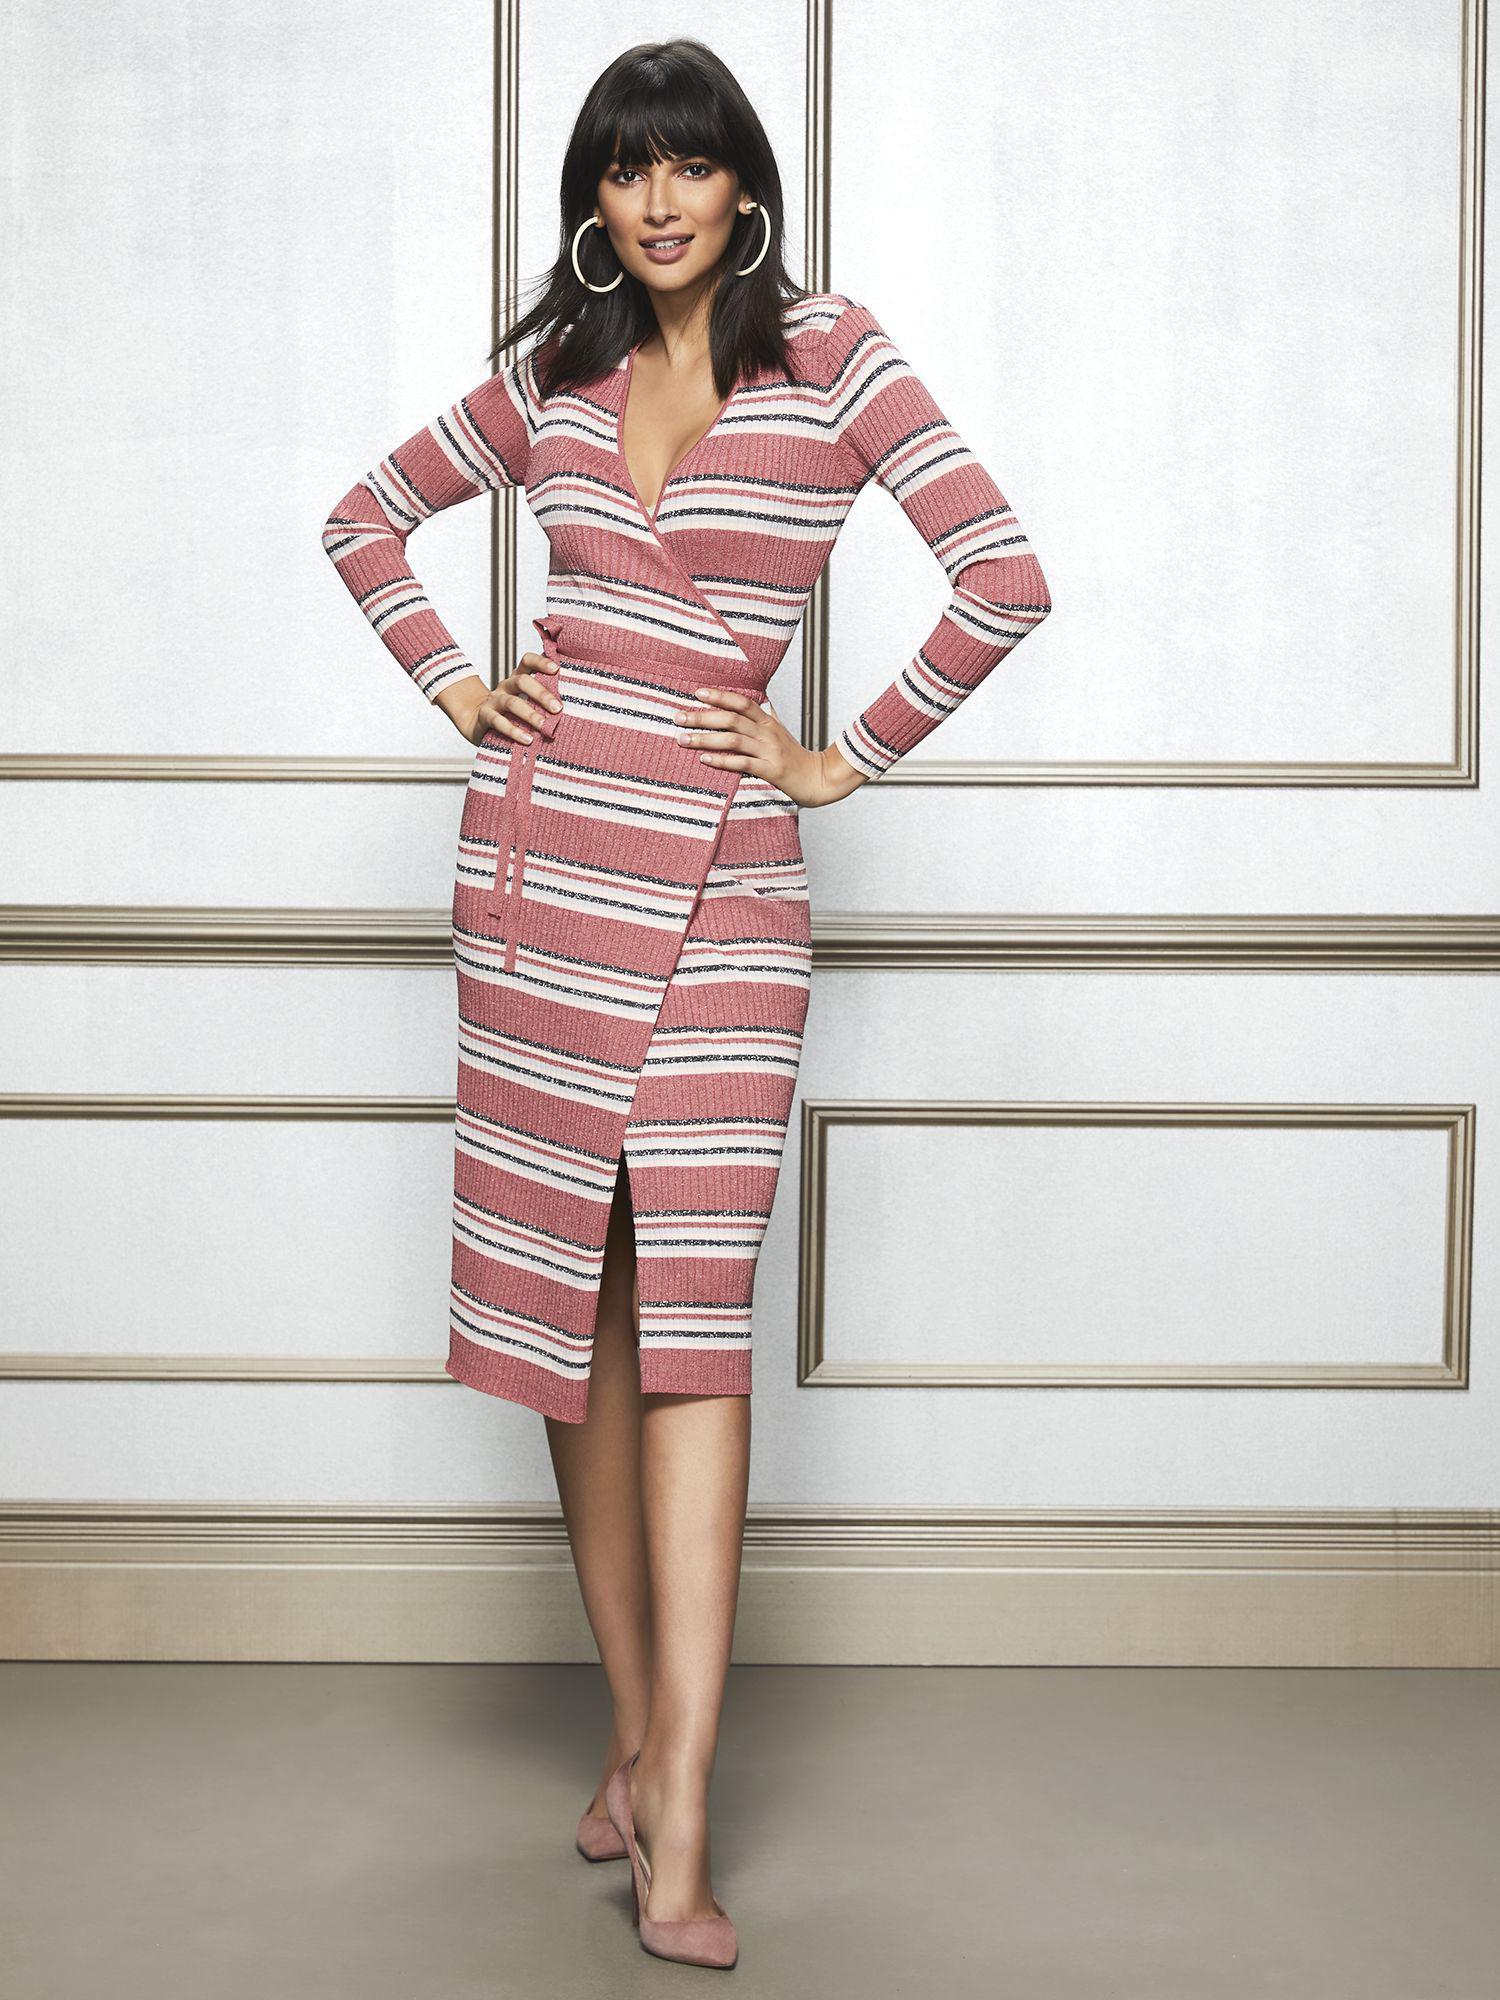 7e7ba1987b New York   Company. Women s Pink Eva Mendes Collection - Delora Metallic Stripe  Sweater Dress